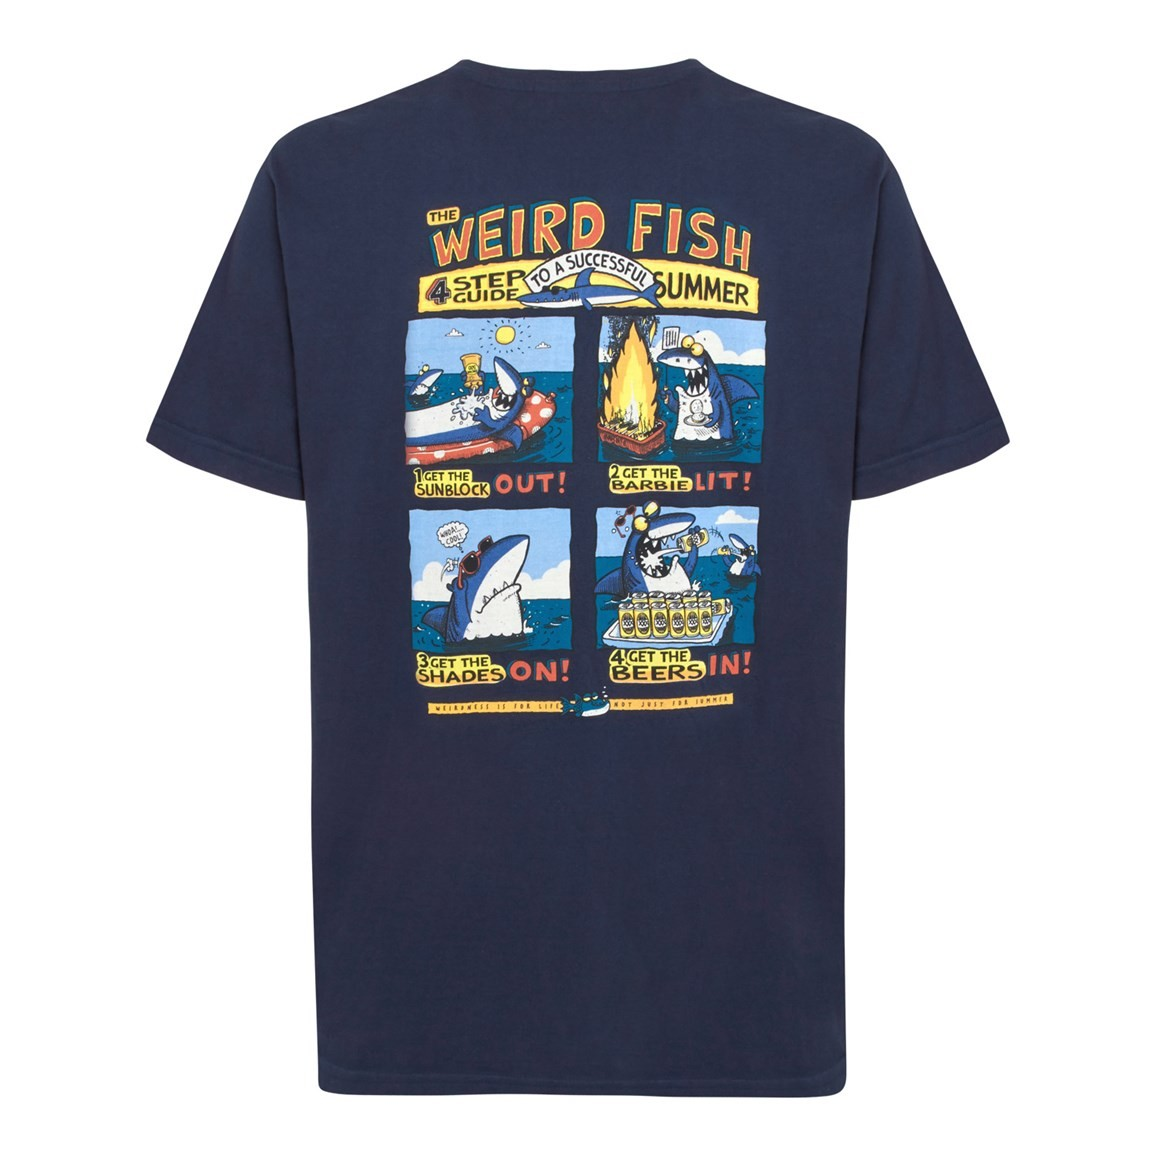 Image of Weird Fish Four Step Guide Back Print Artist T-Shirt Dark Navy Size 4XL